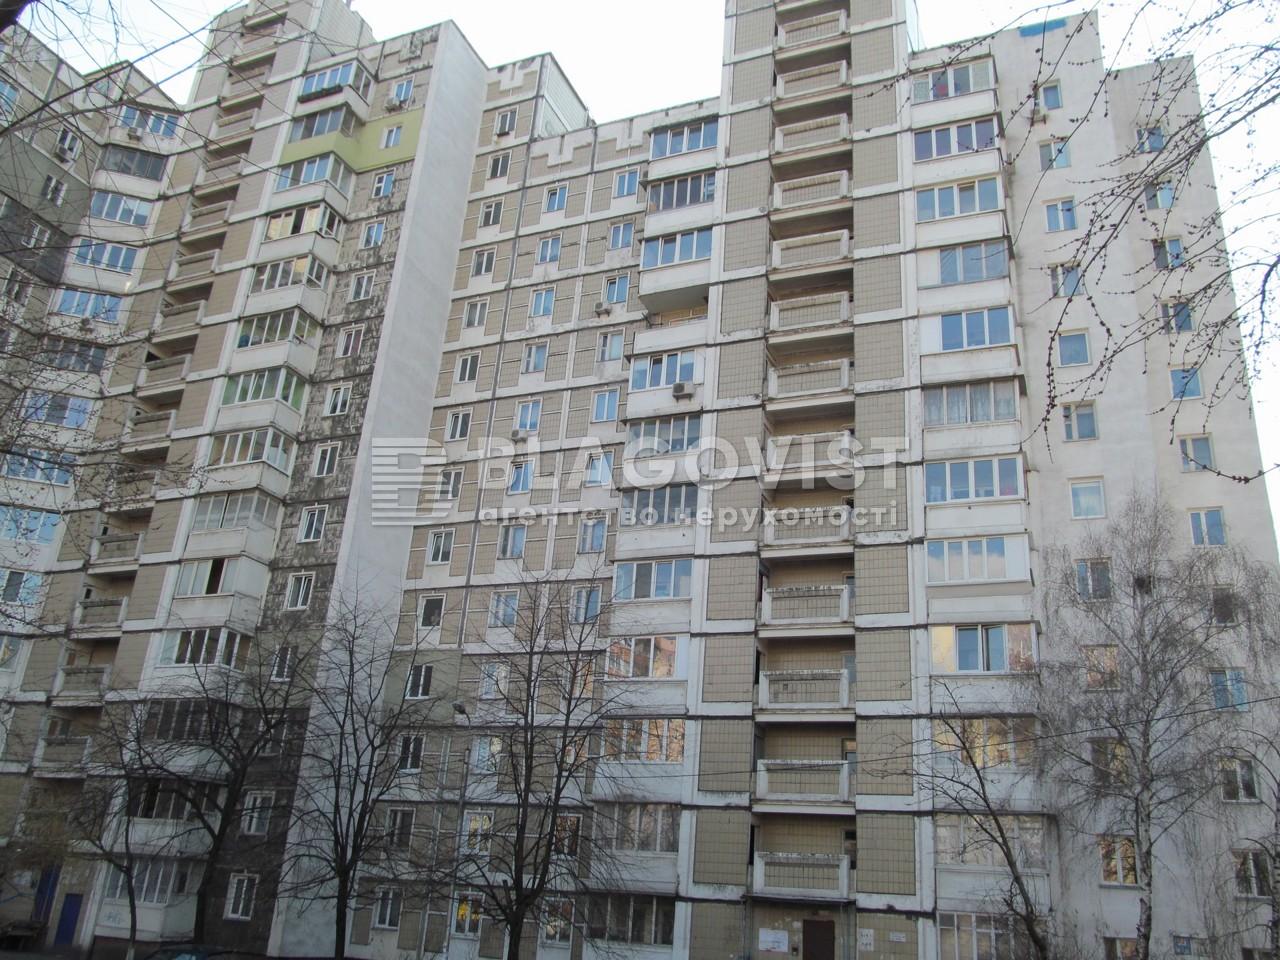 Квартира H-31583, Харьковское шоссе, 158, Киев - Фото 1